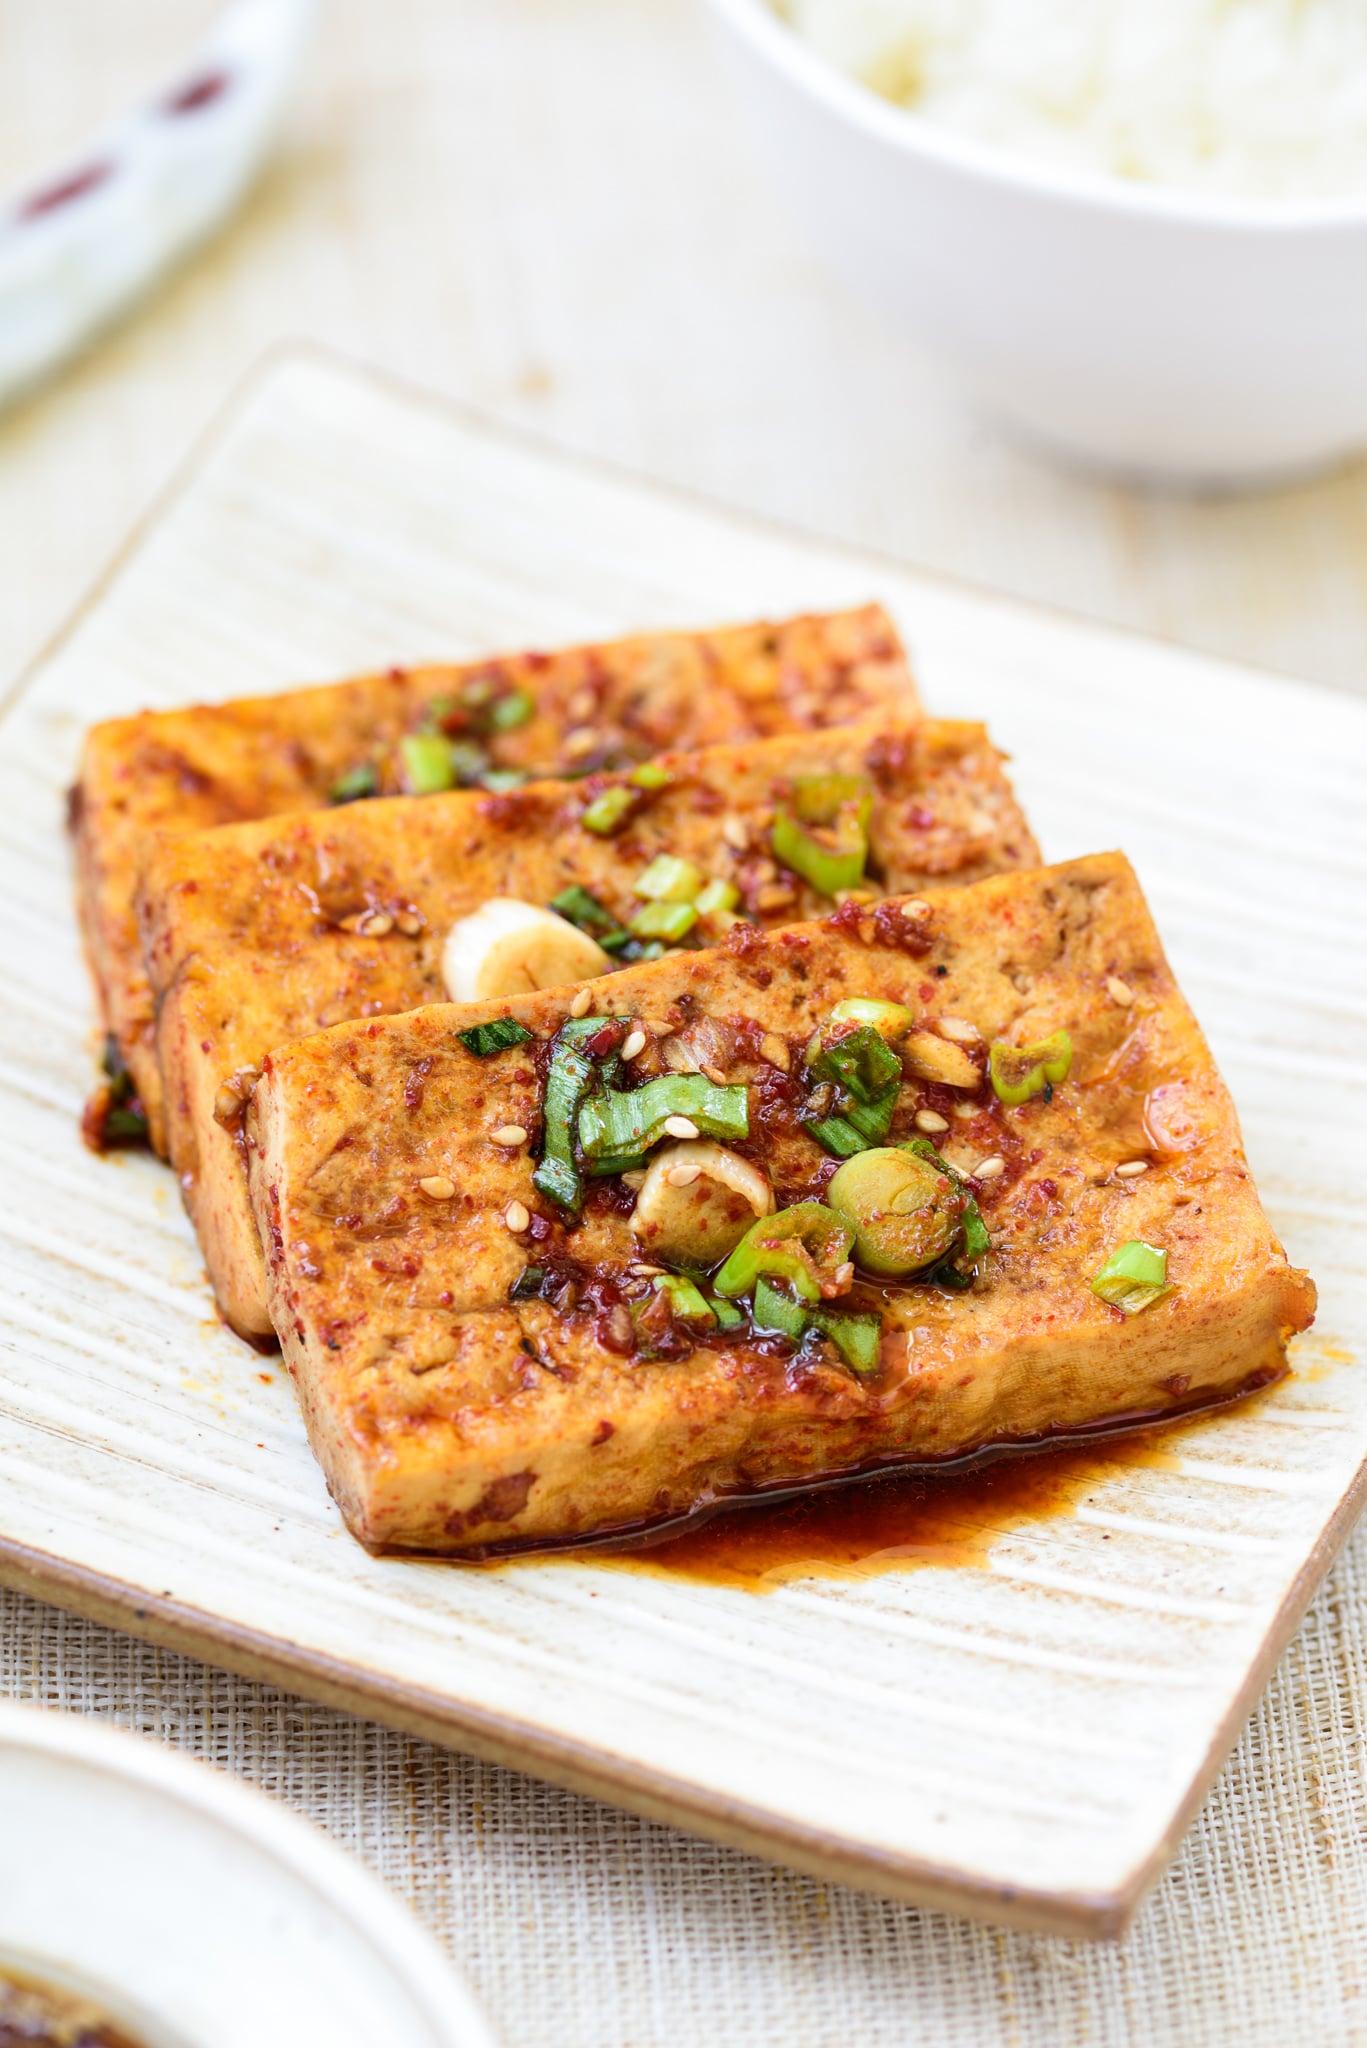 DSC3340 2 - Dubu Jorim (Braised Tofu)